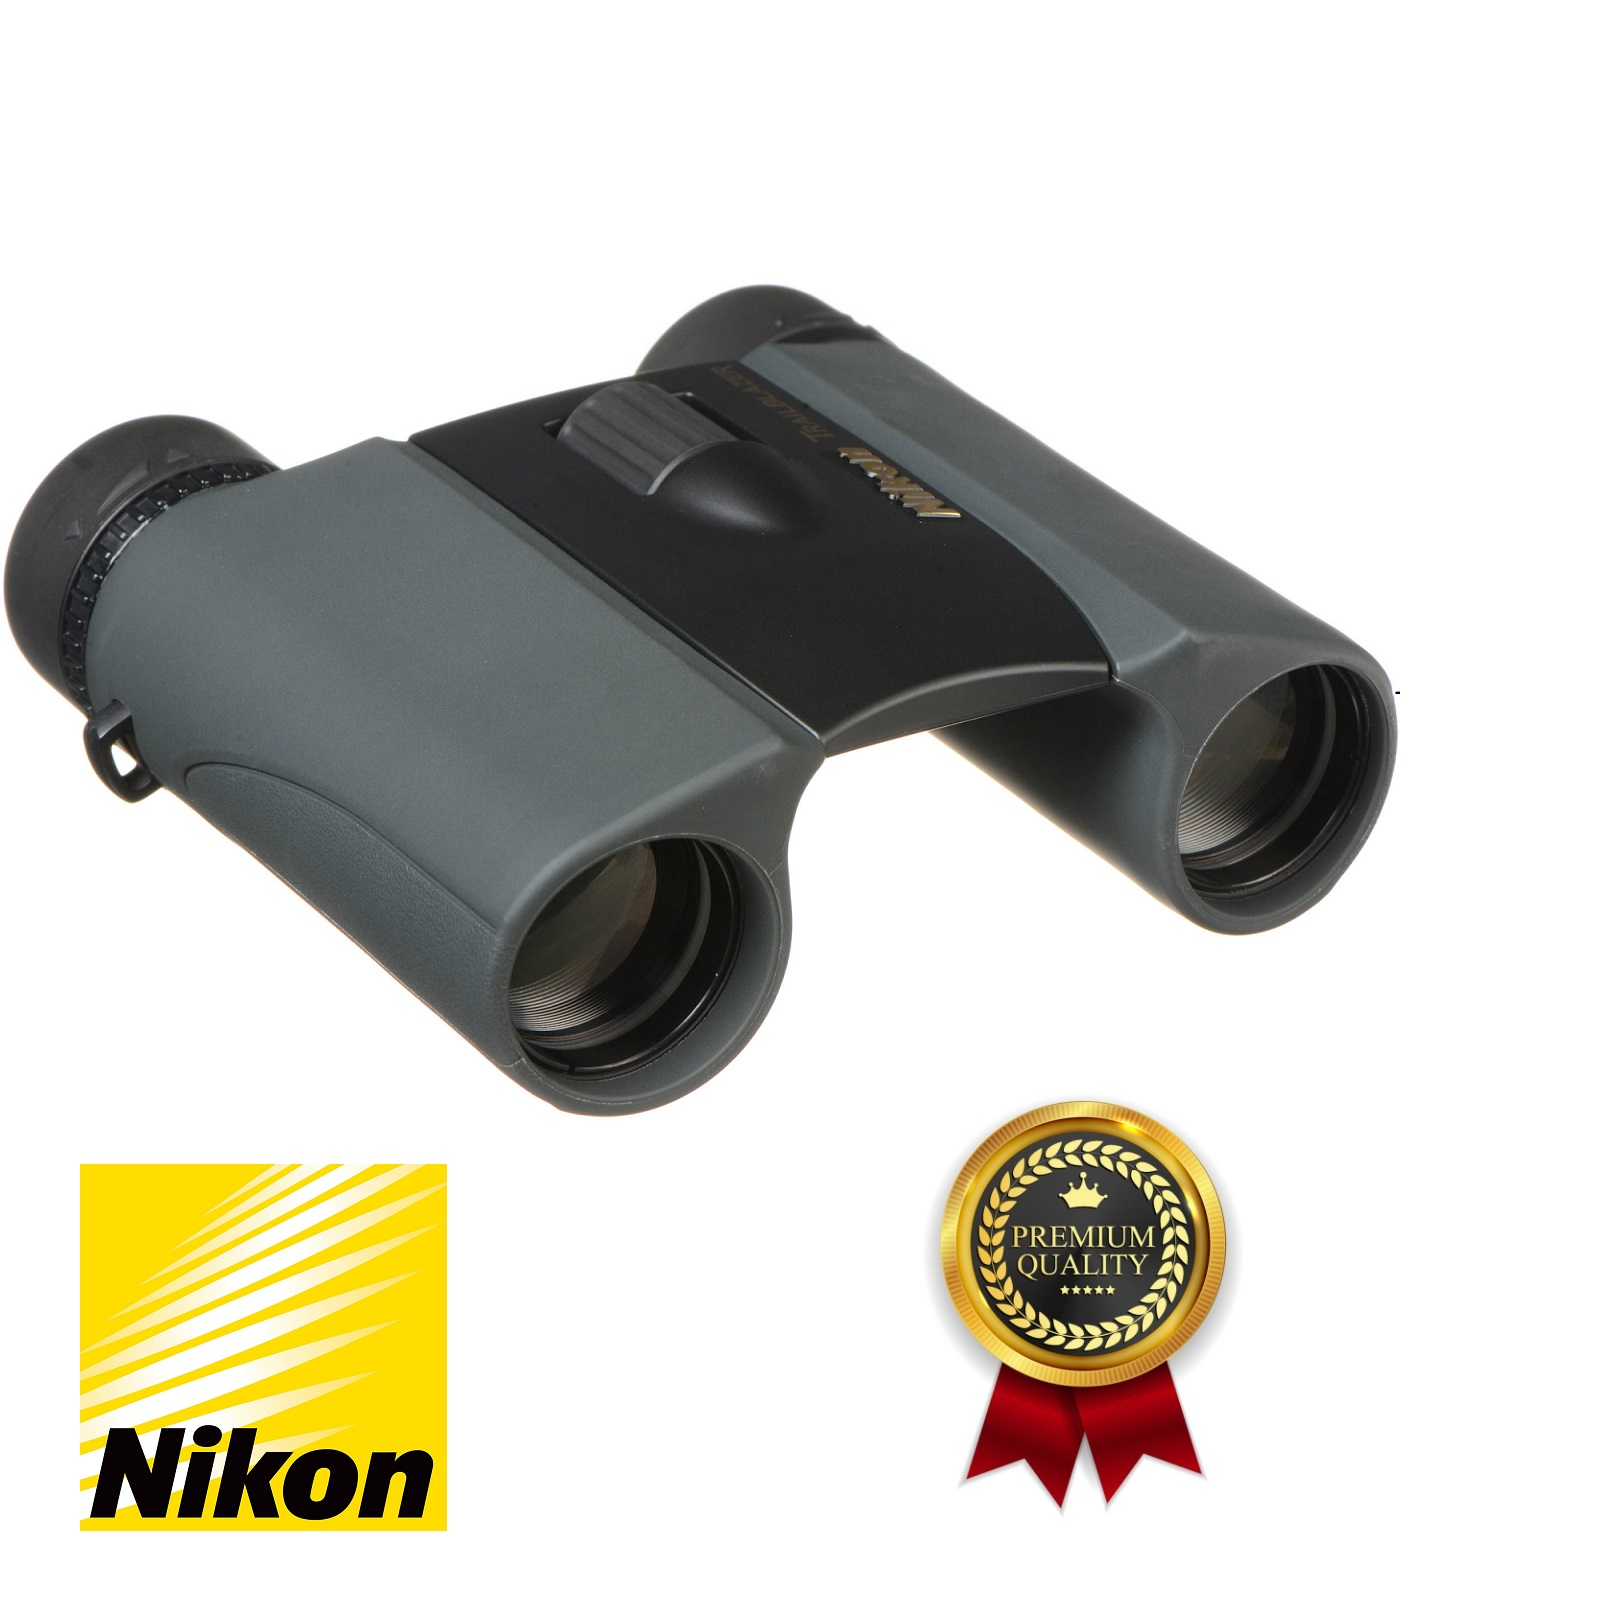 Cameras & Photo Binoculars & Telescopes Velbon Binoculars Accessories Tripod Mounting Adapter Binoculars Com Holder Jp